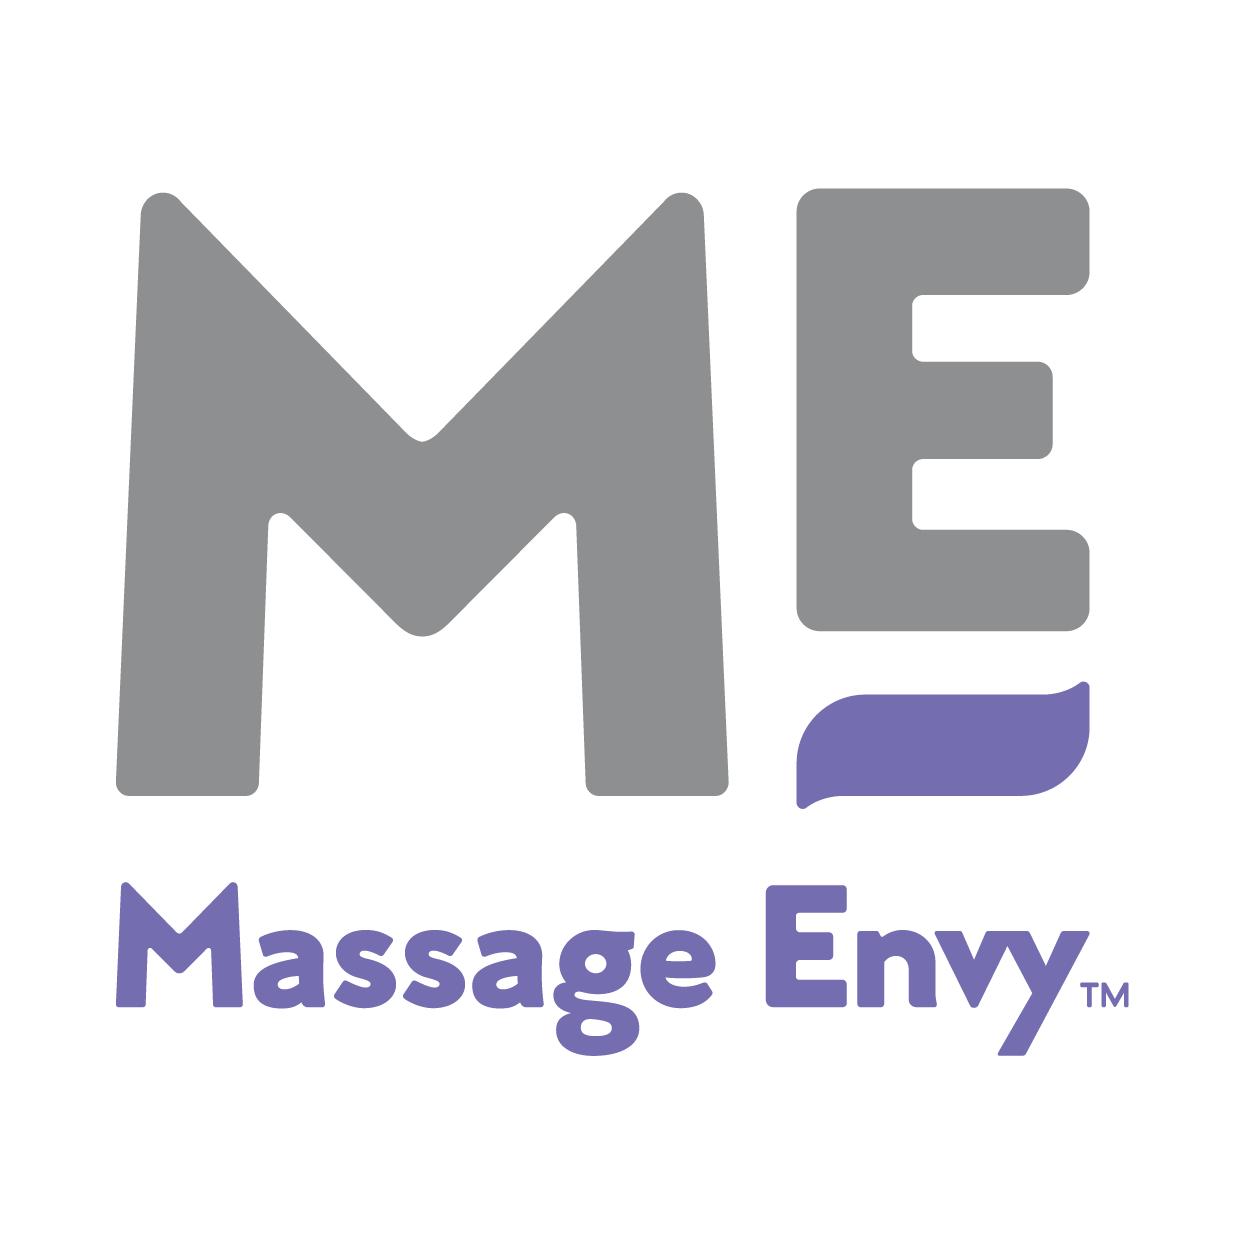 Massage Envy - RiverGate Logo